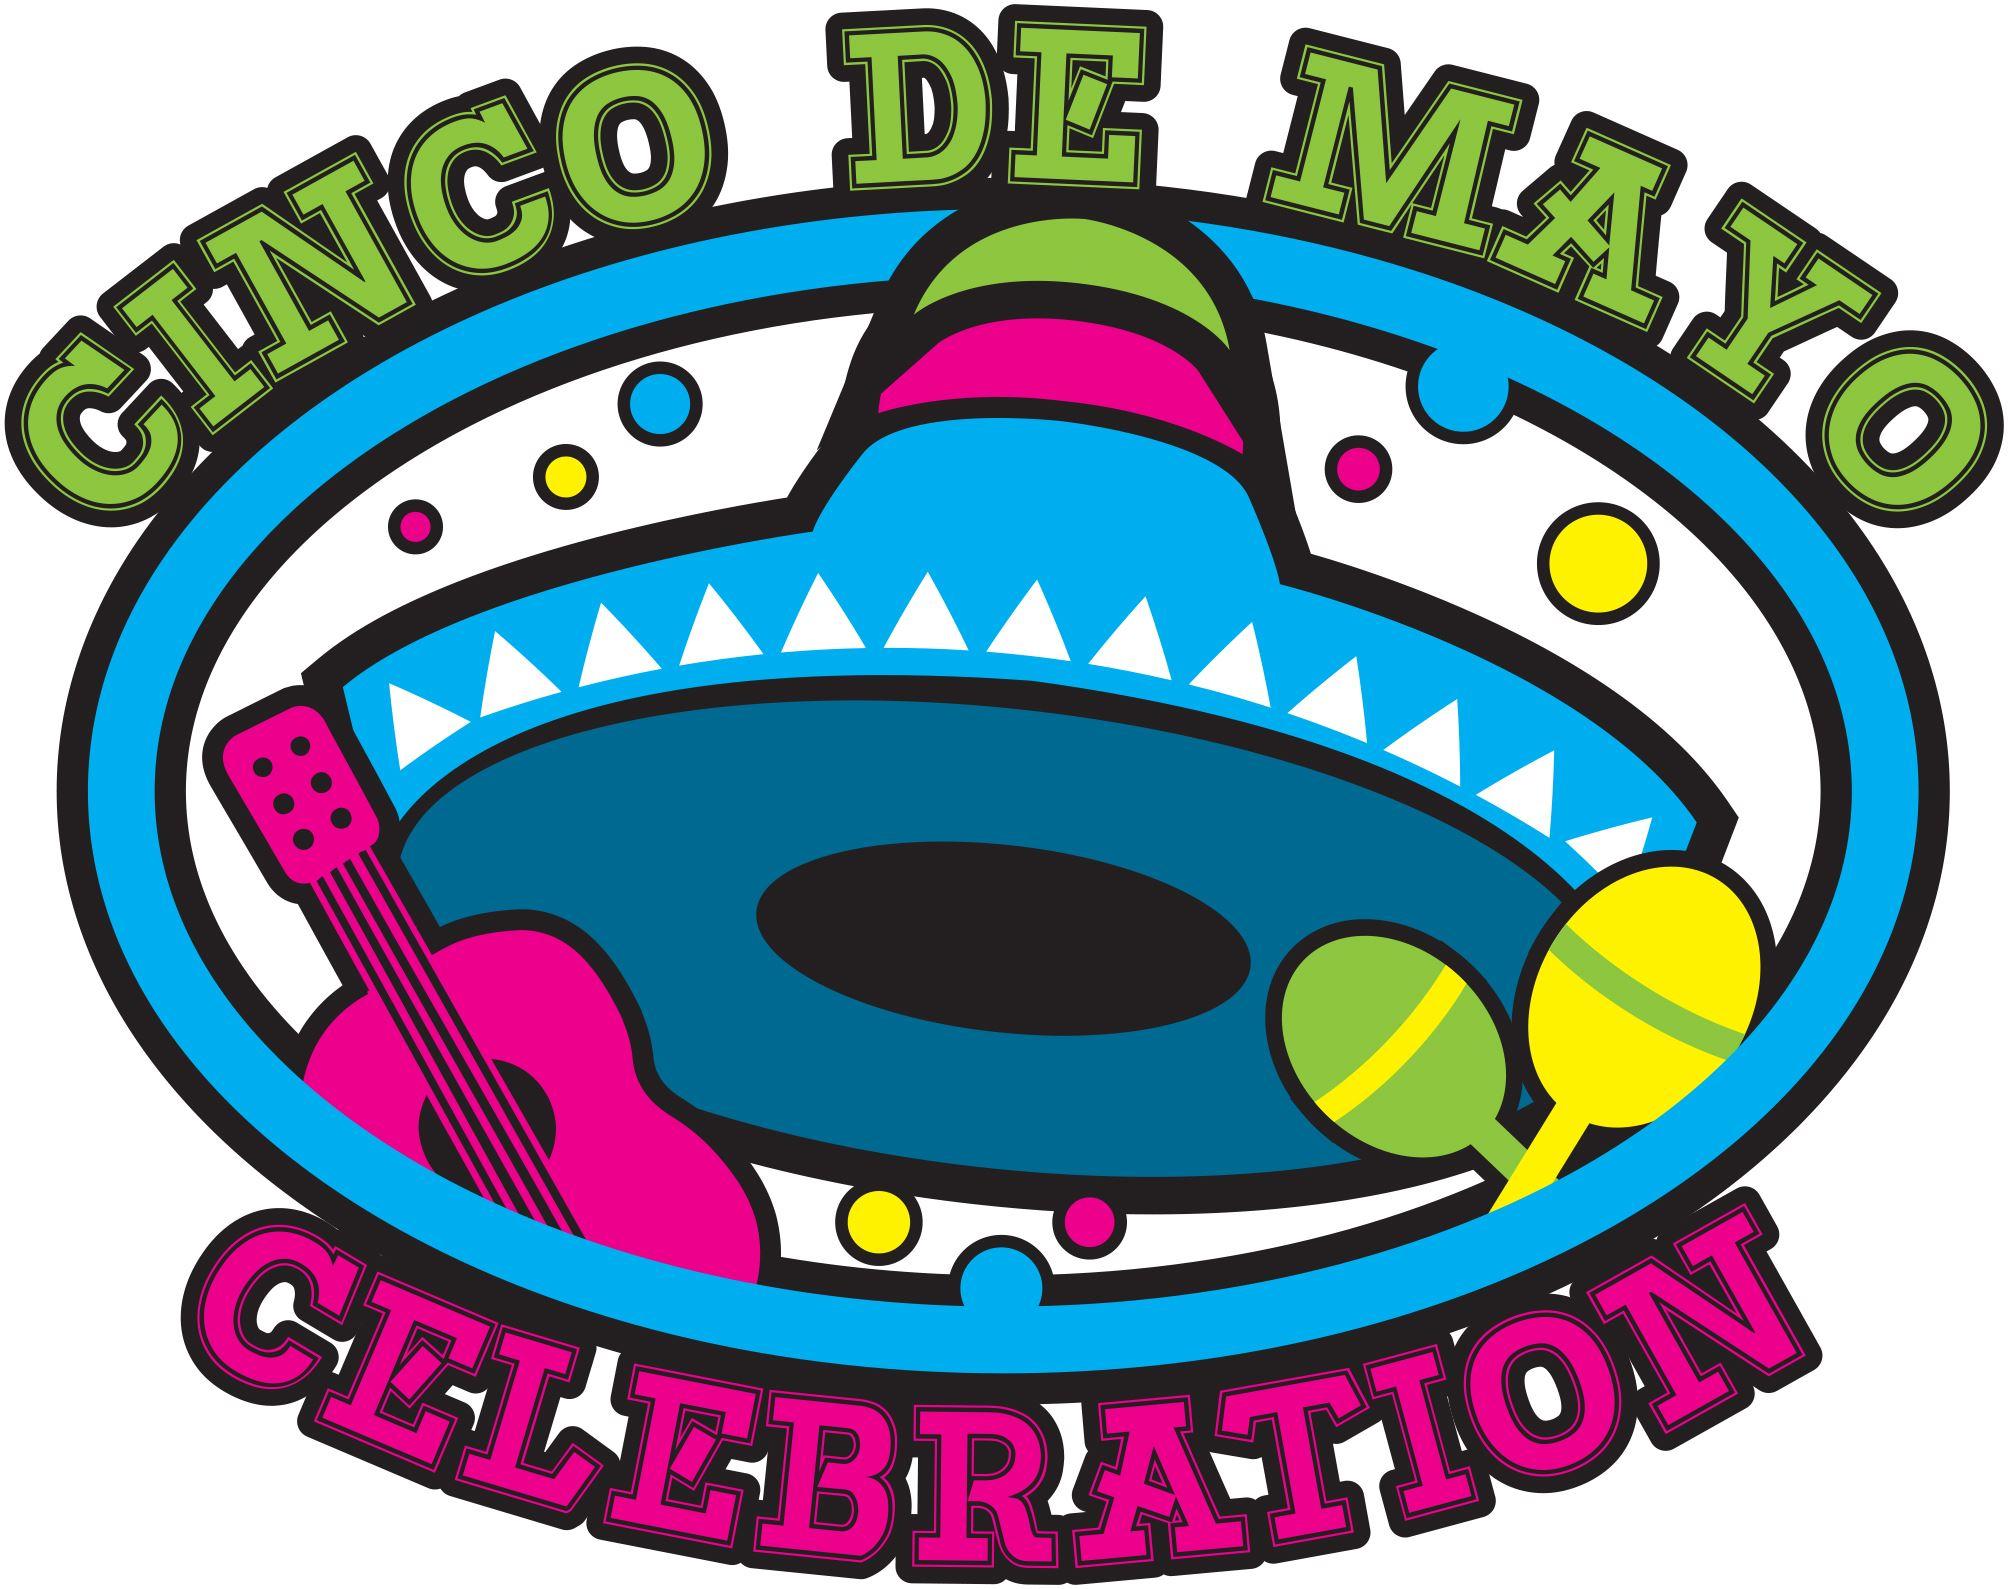 2008x1589 Cinco De Mayo Pictures 2017 Wishes Celebration Ideas Cinco De Mayo